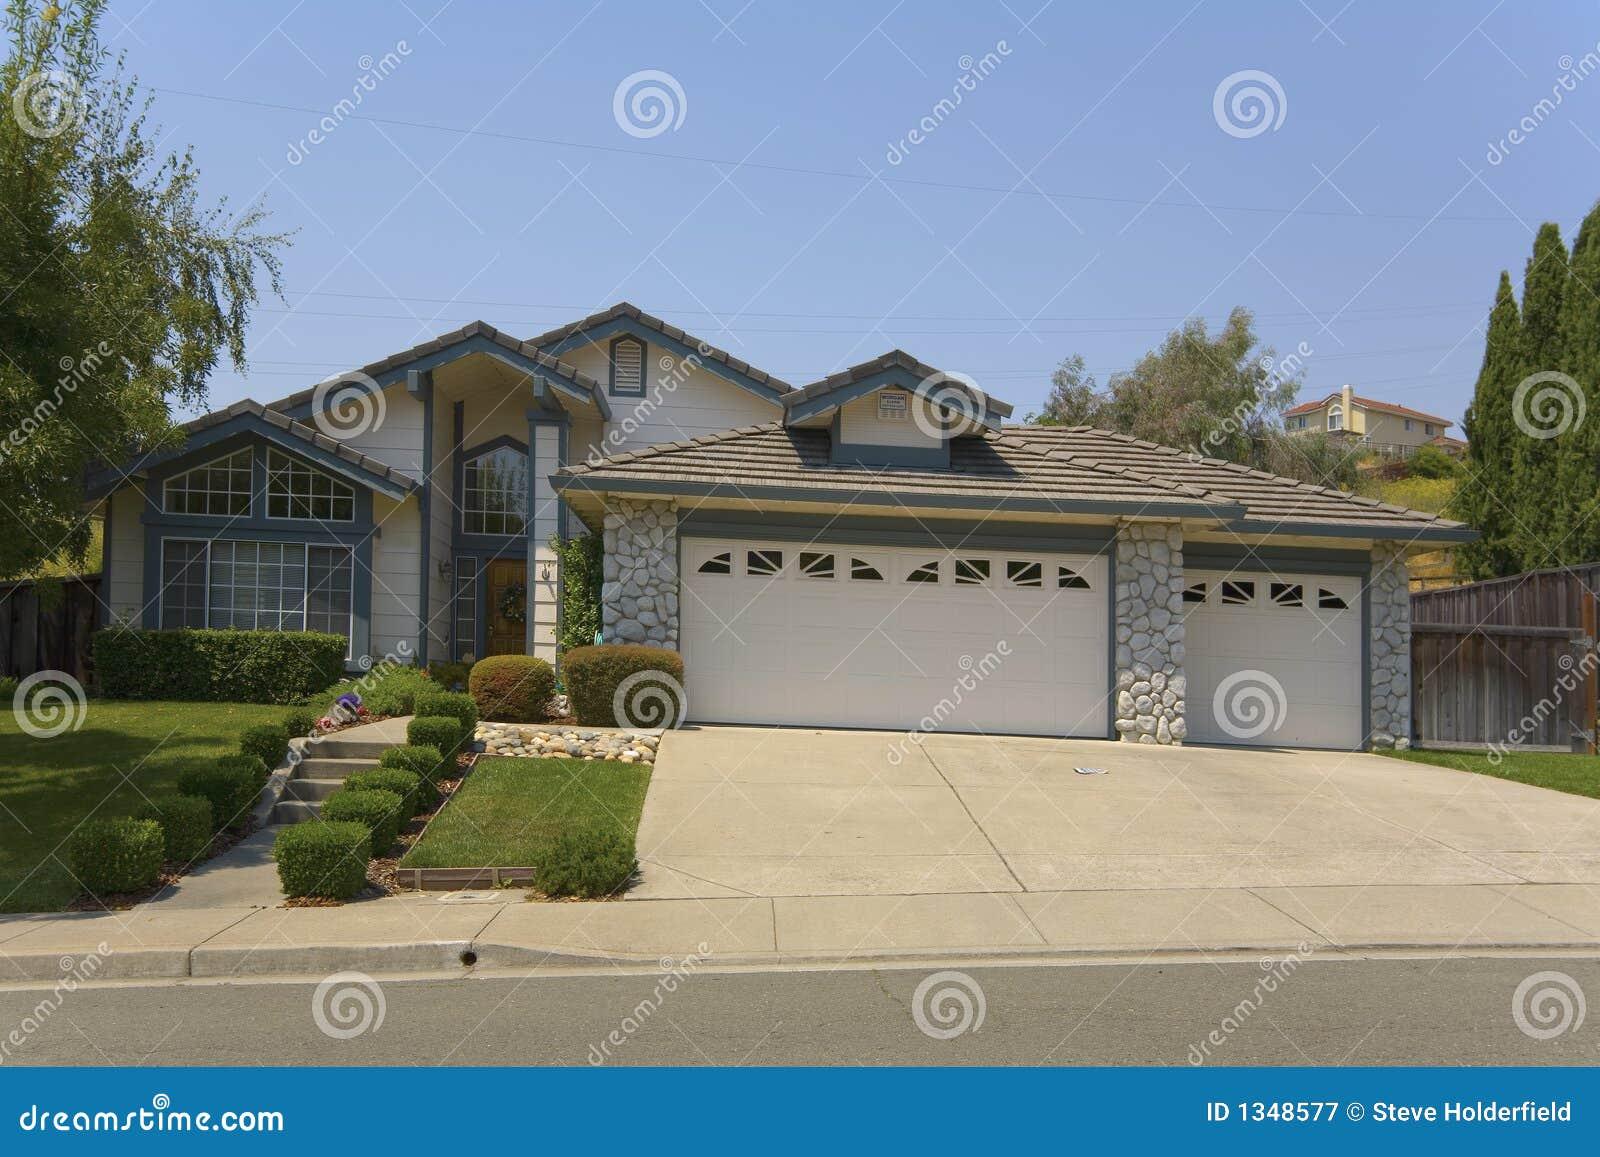 contemporary single story home stock image image of bricks